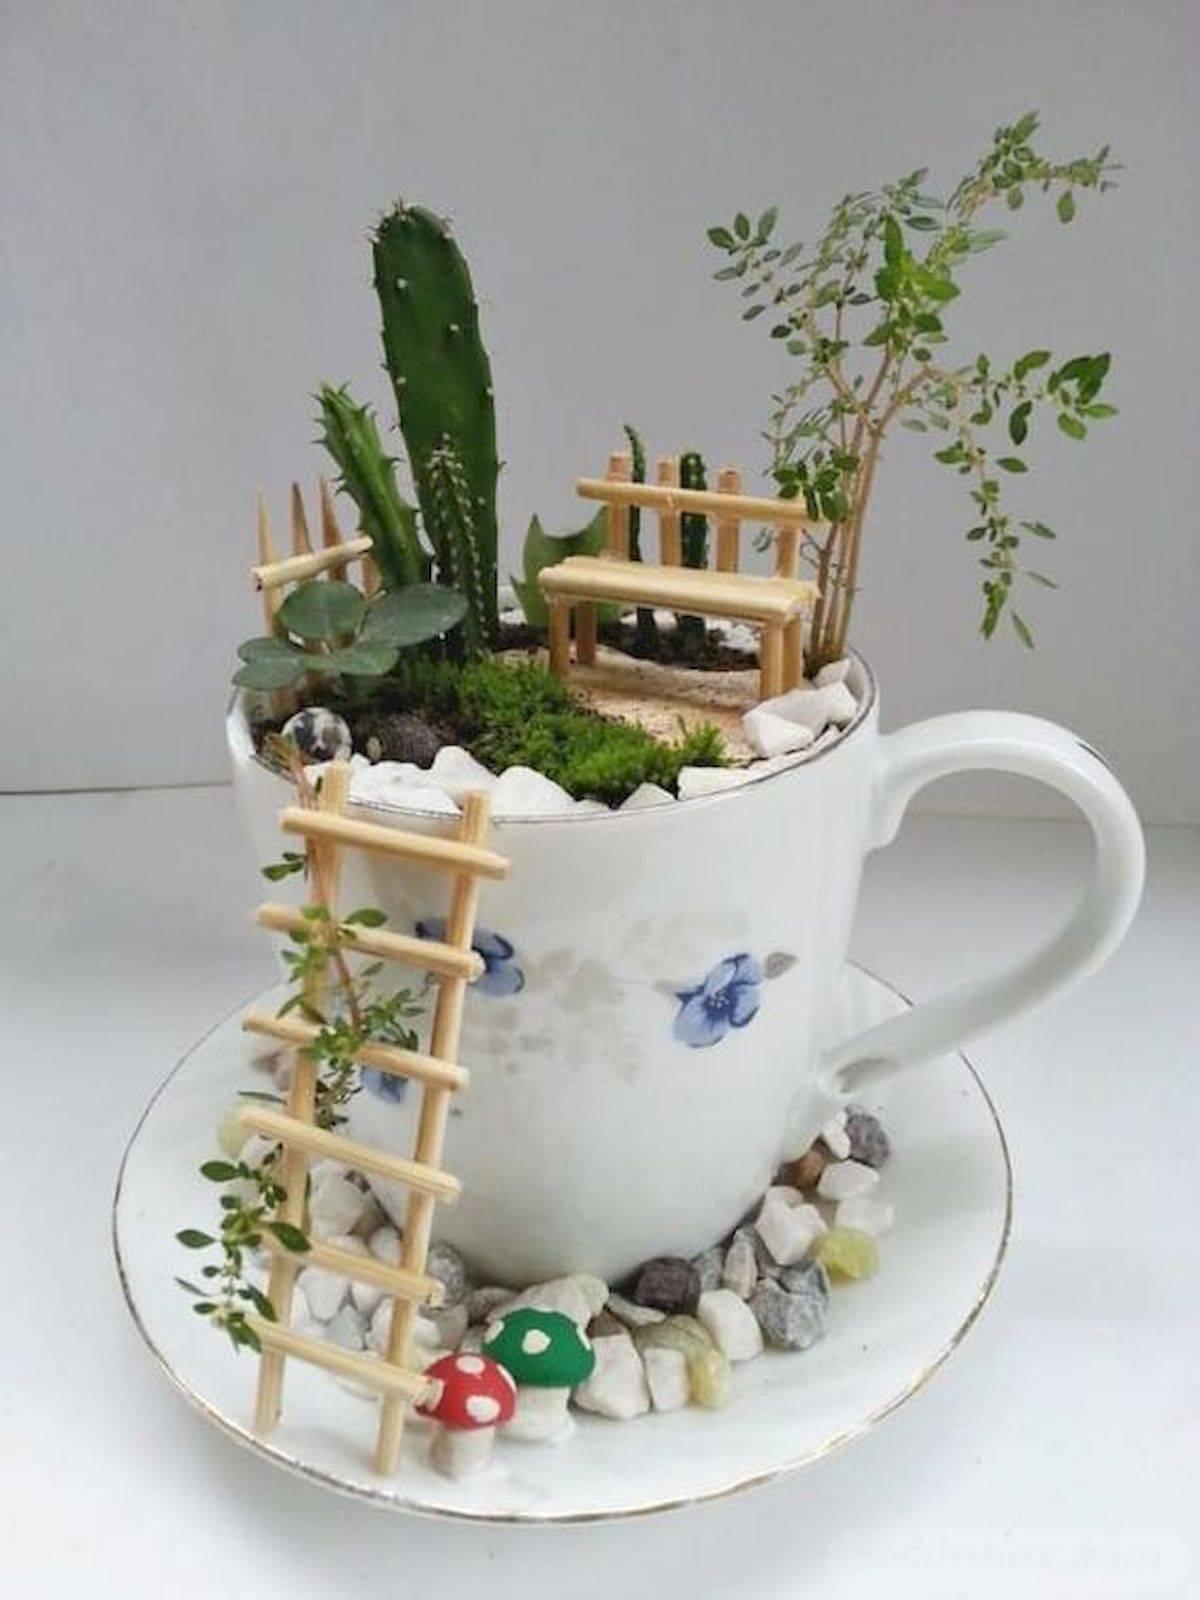 diy garden easy-789255903423460194